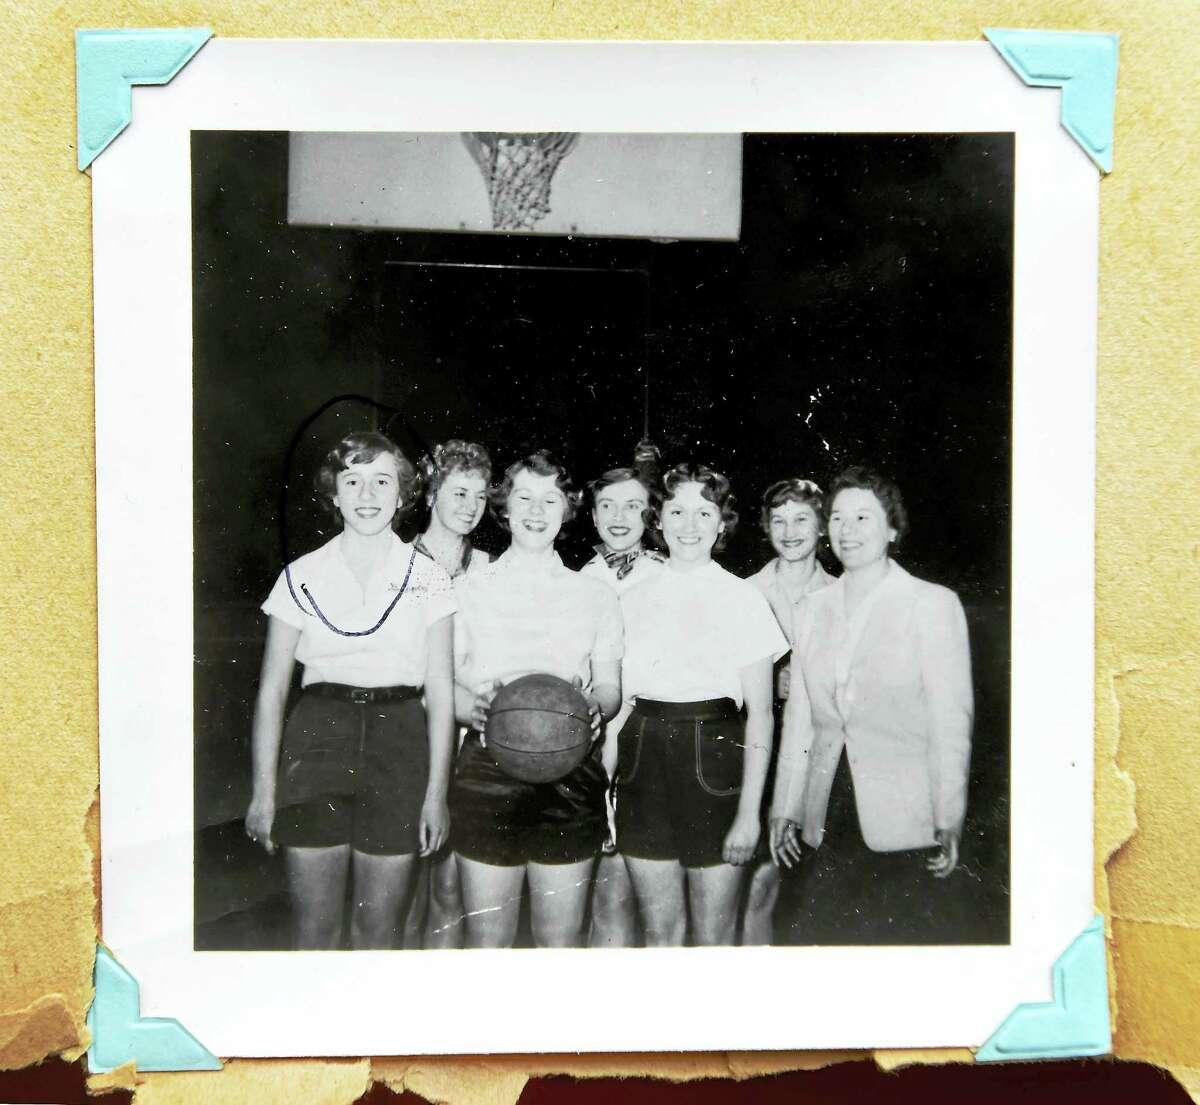 Barbara Lupino Mecca, far left, and the 1952-53 Quinnipiac College women's basketball team.